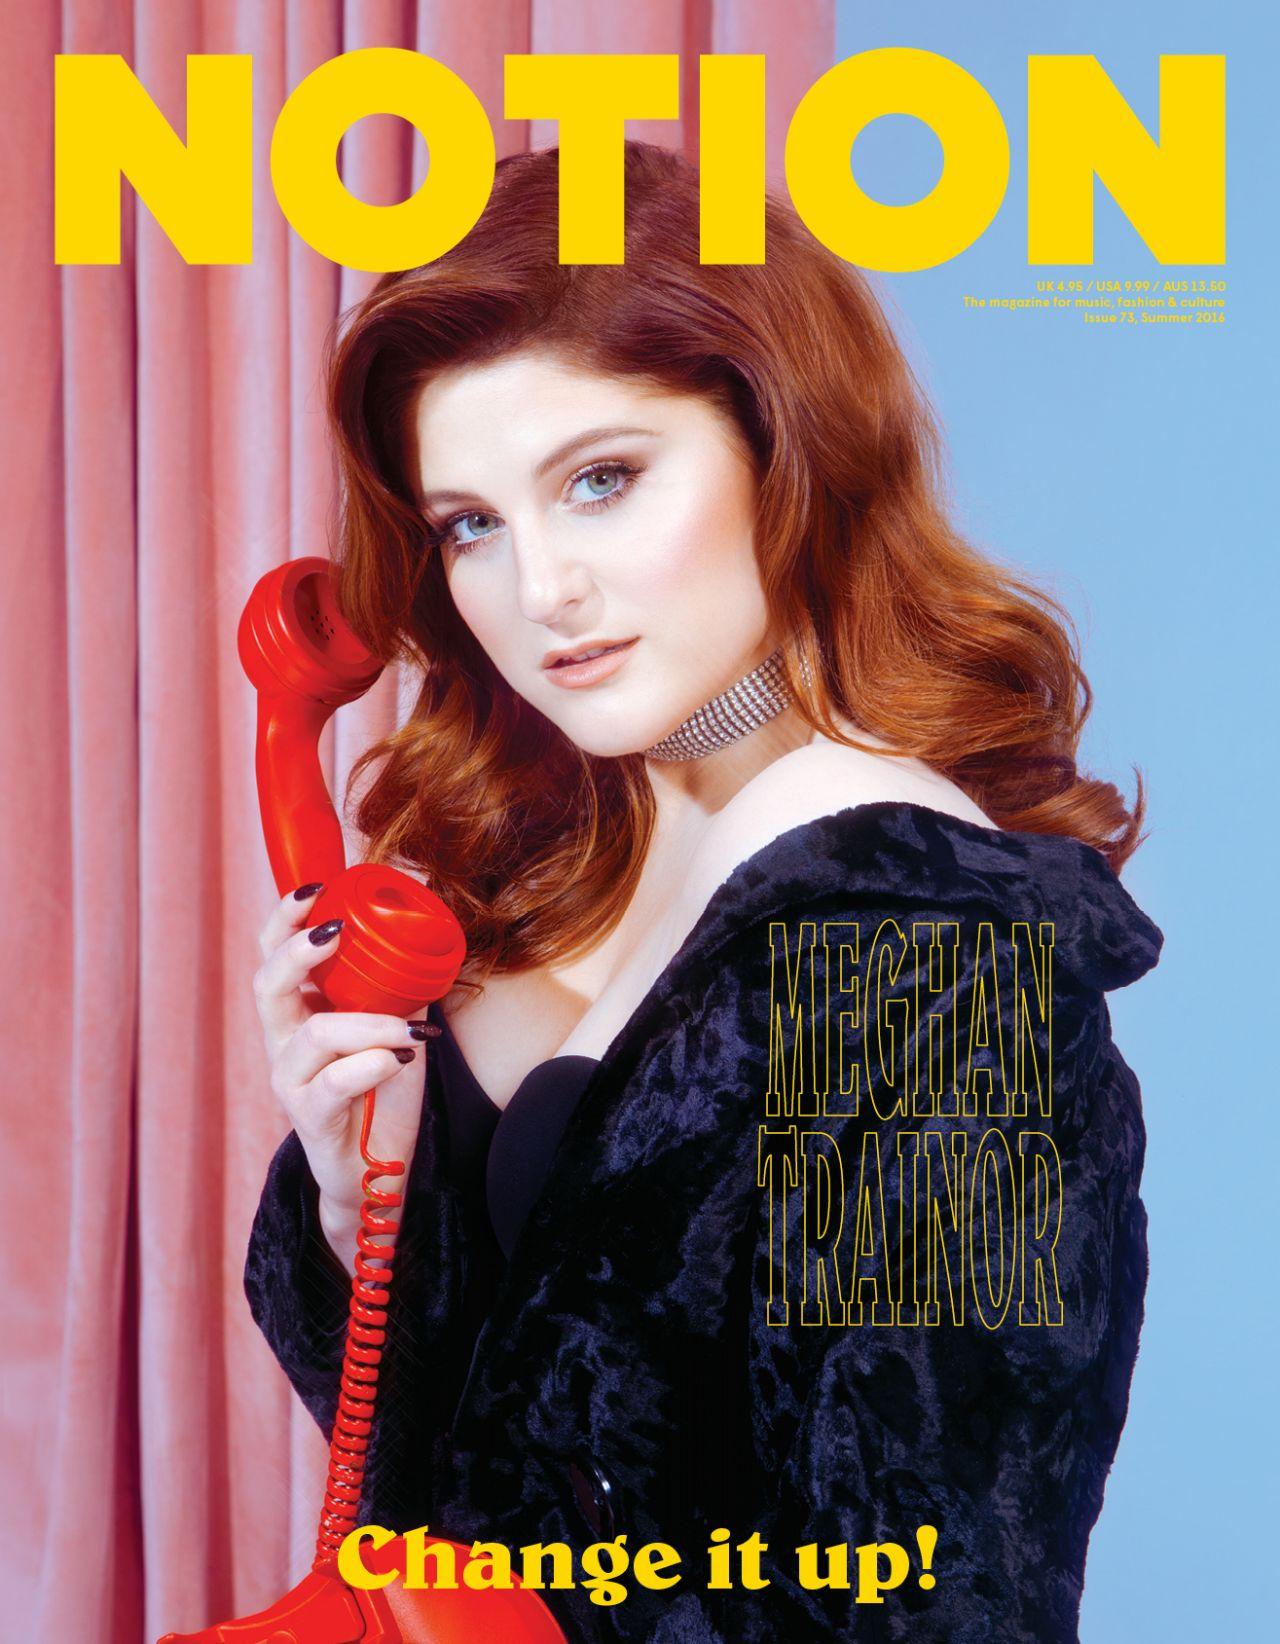 Meghan Trainor Notion Magazine 73 Summer 2016